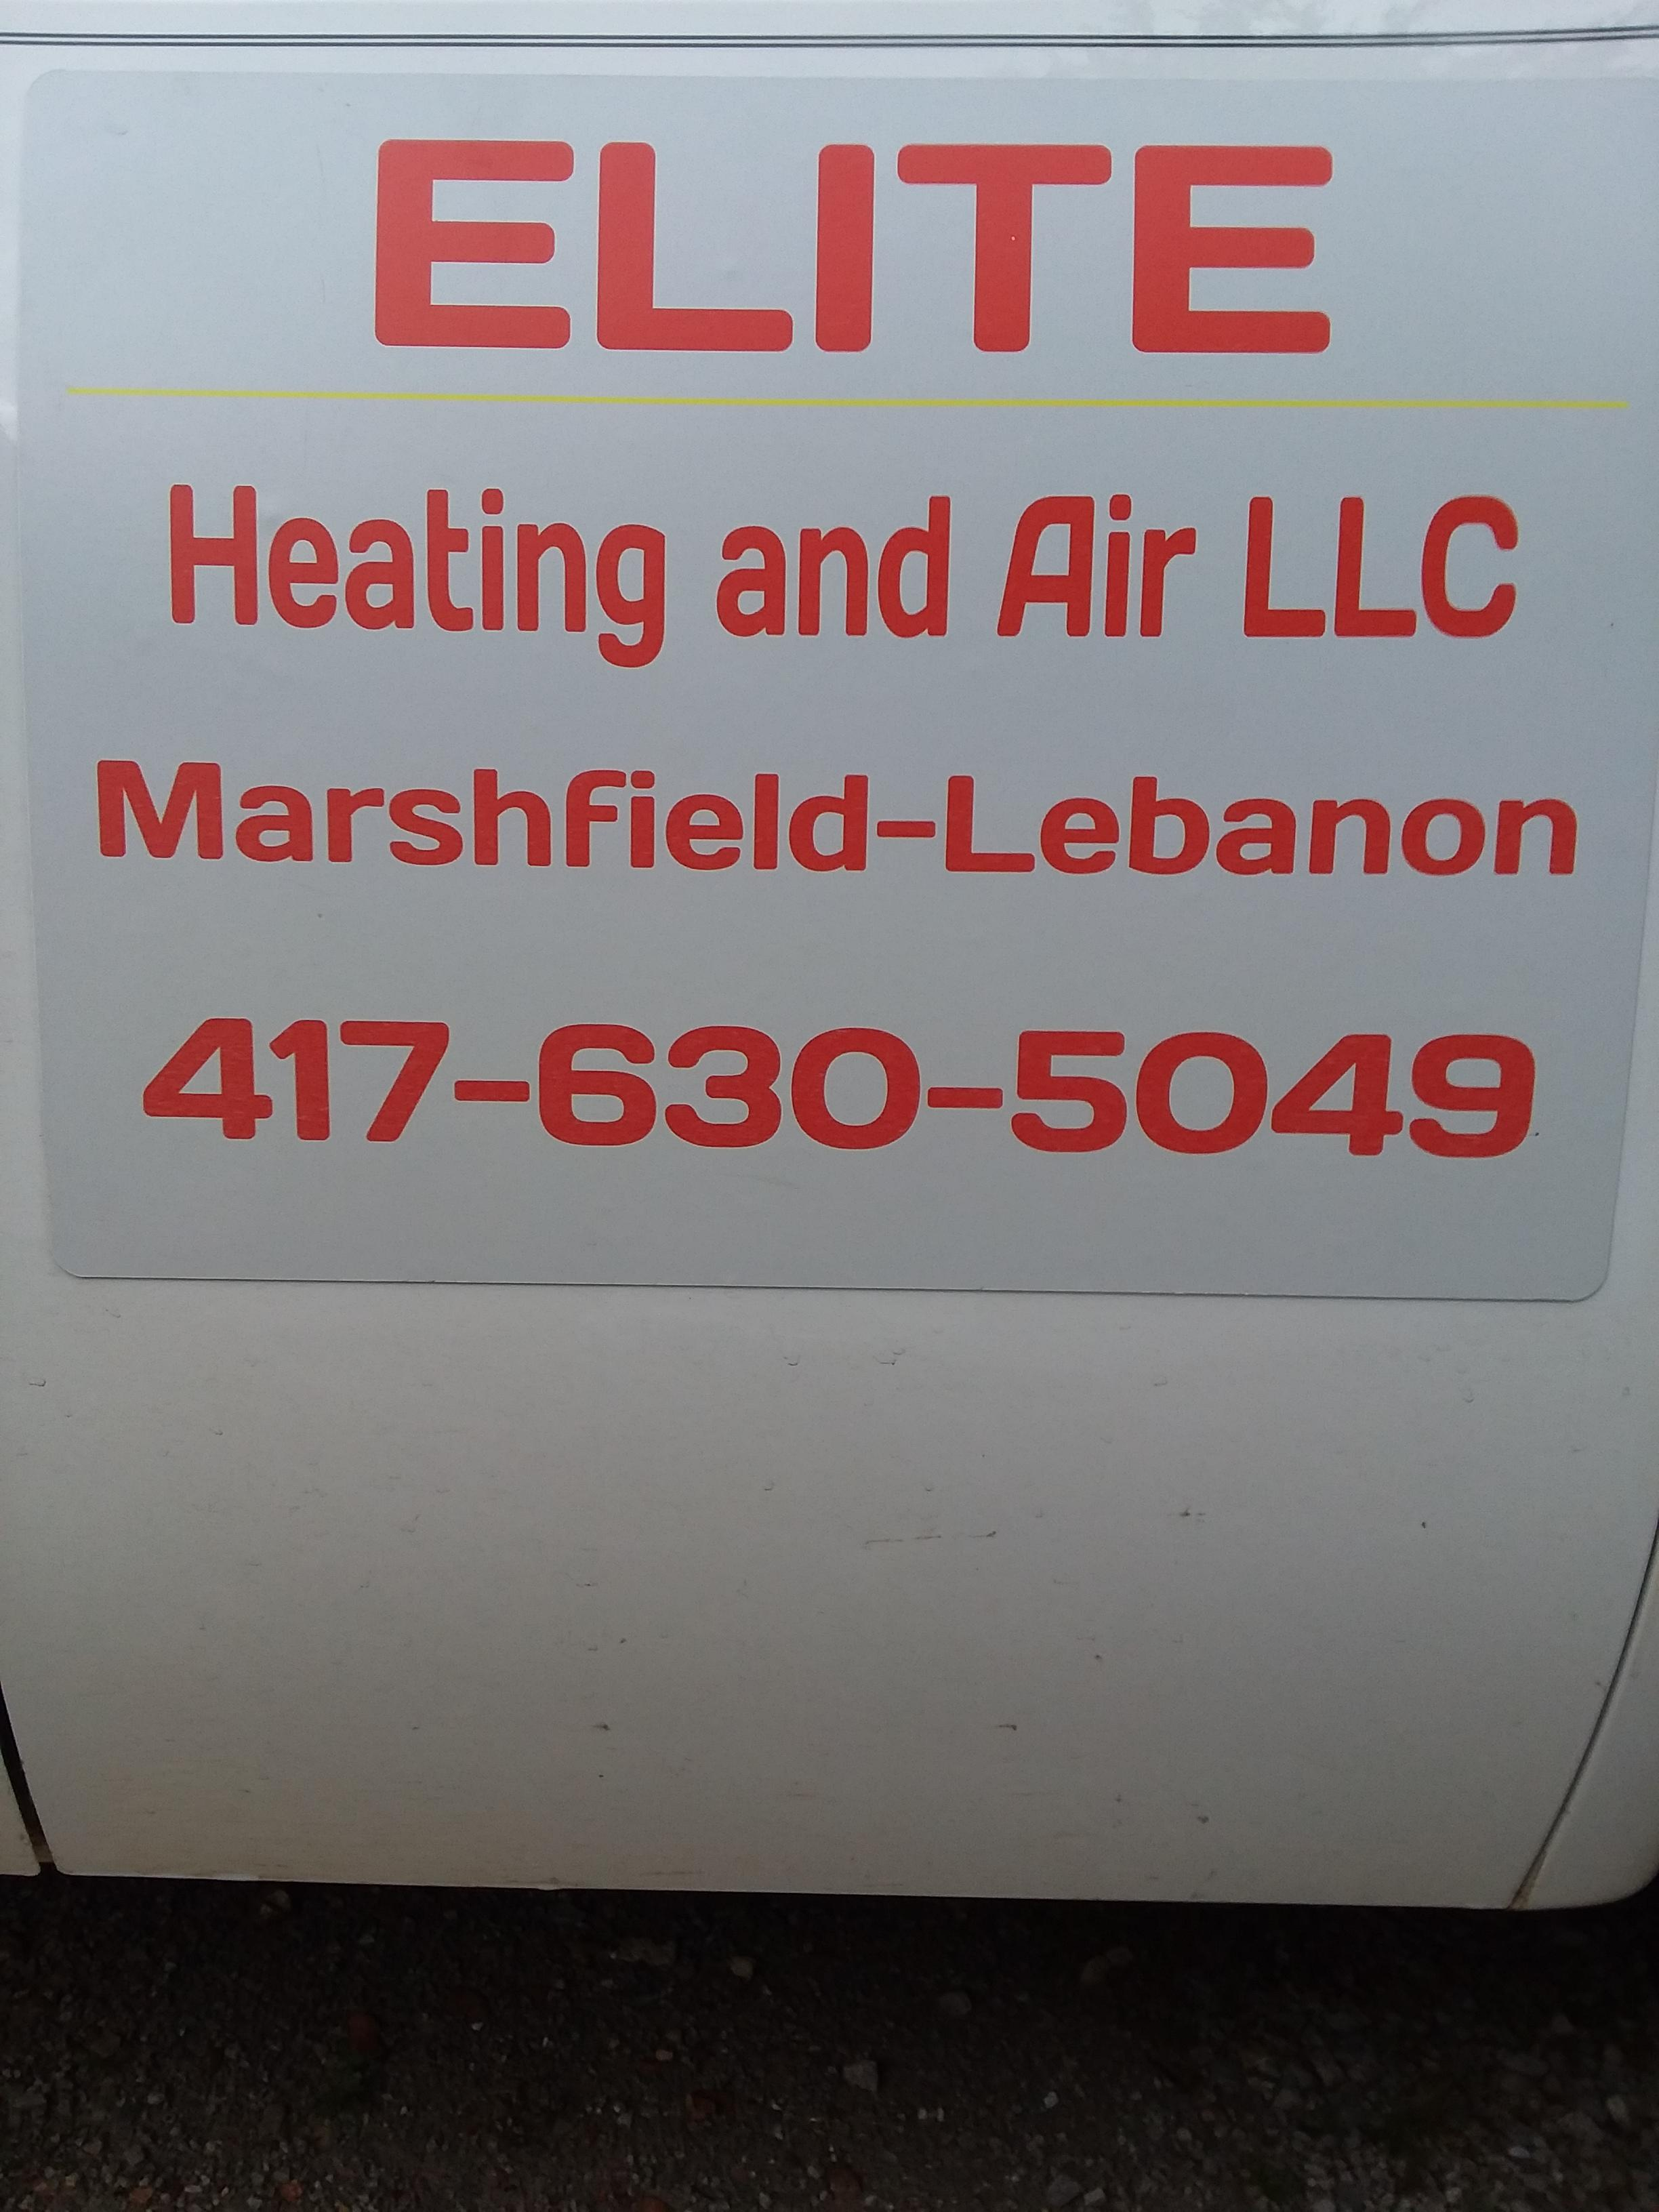 ELITE HEATING AND AIR LLC image 1